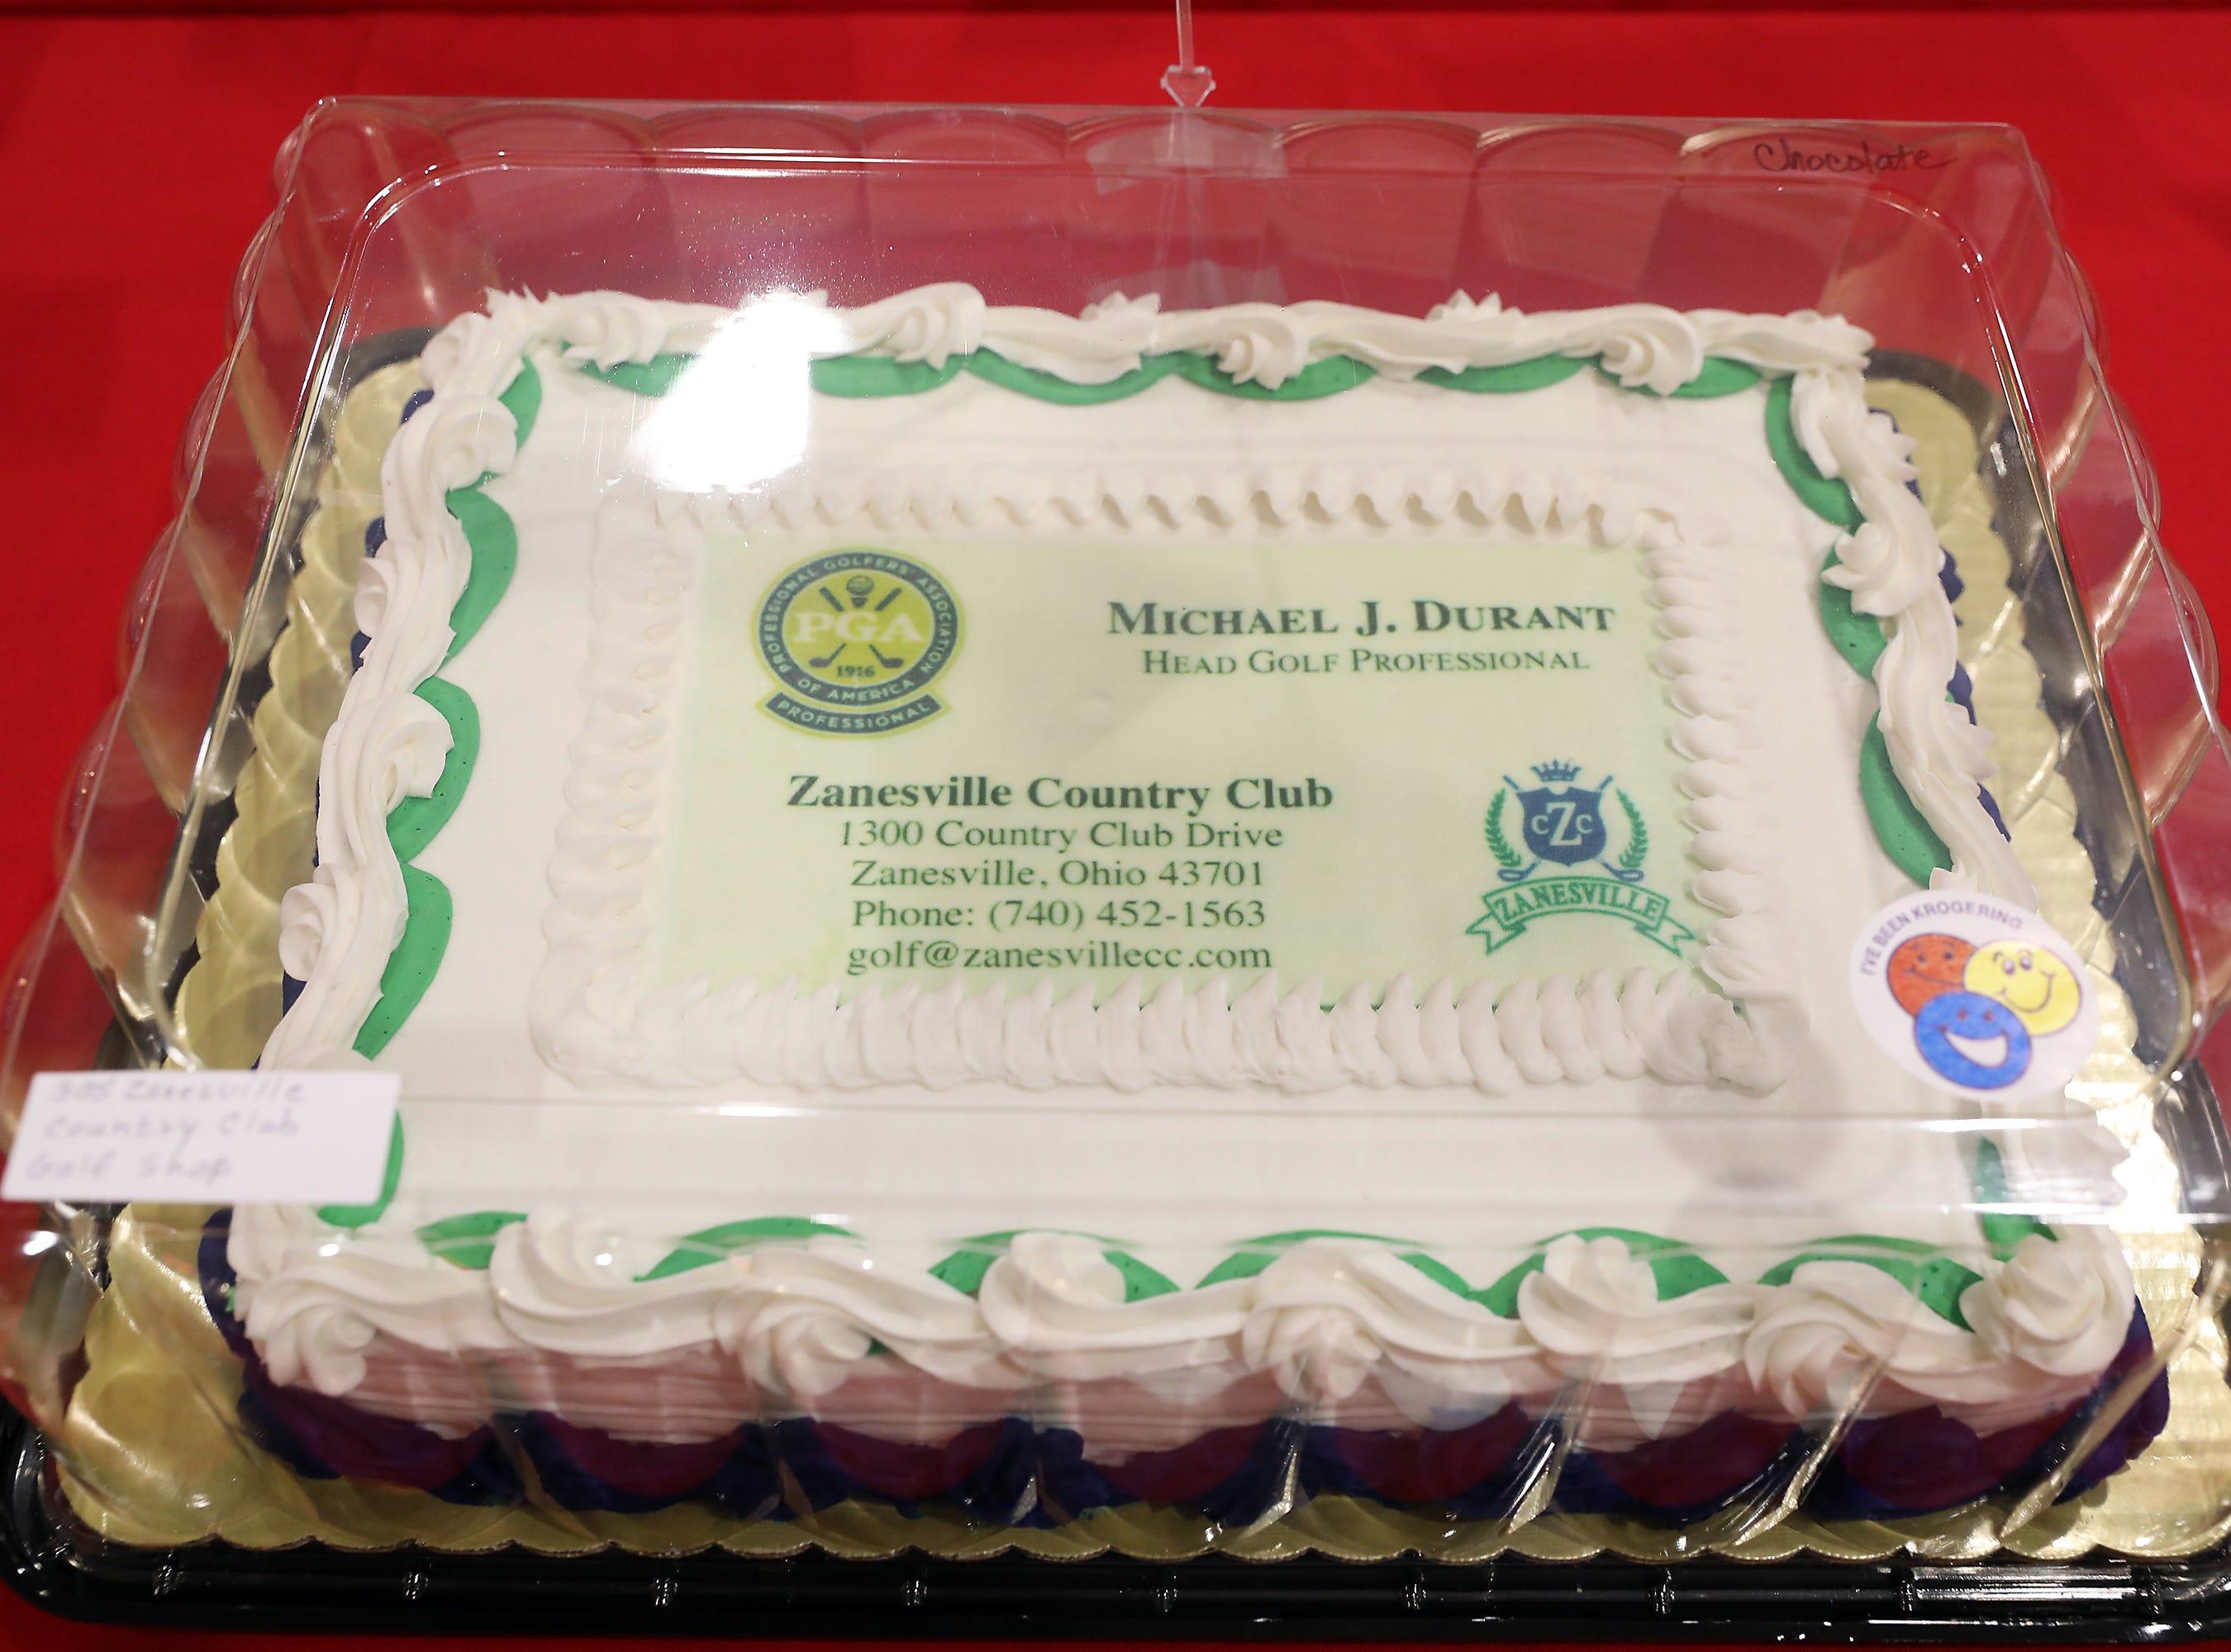 1 P.M. Friday cake 305 Zanesville Country Club Golf Shop - Mizund Cue Hybrid 22 degree Loff, Stiff flex, right handed